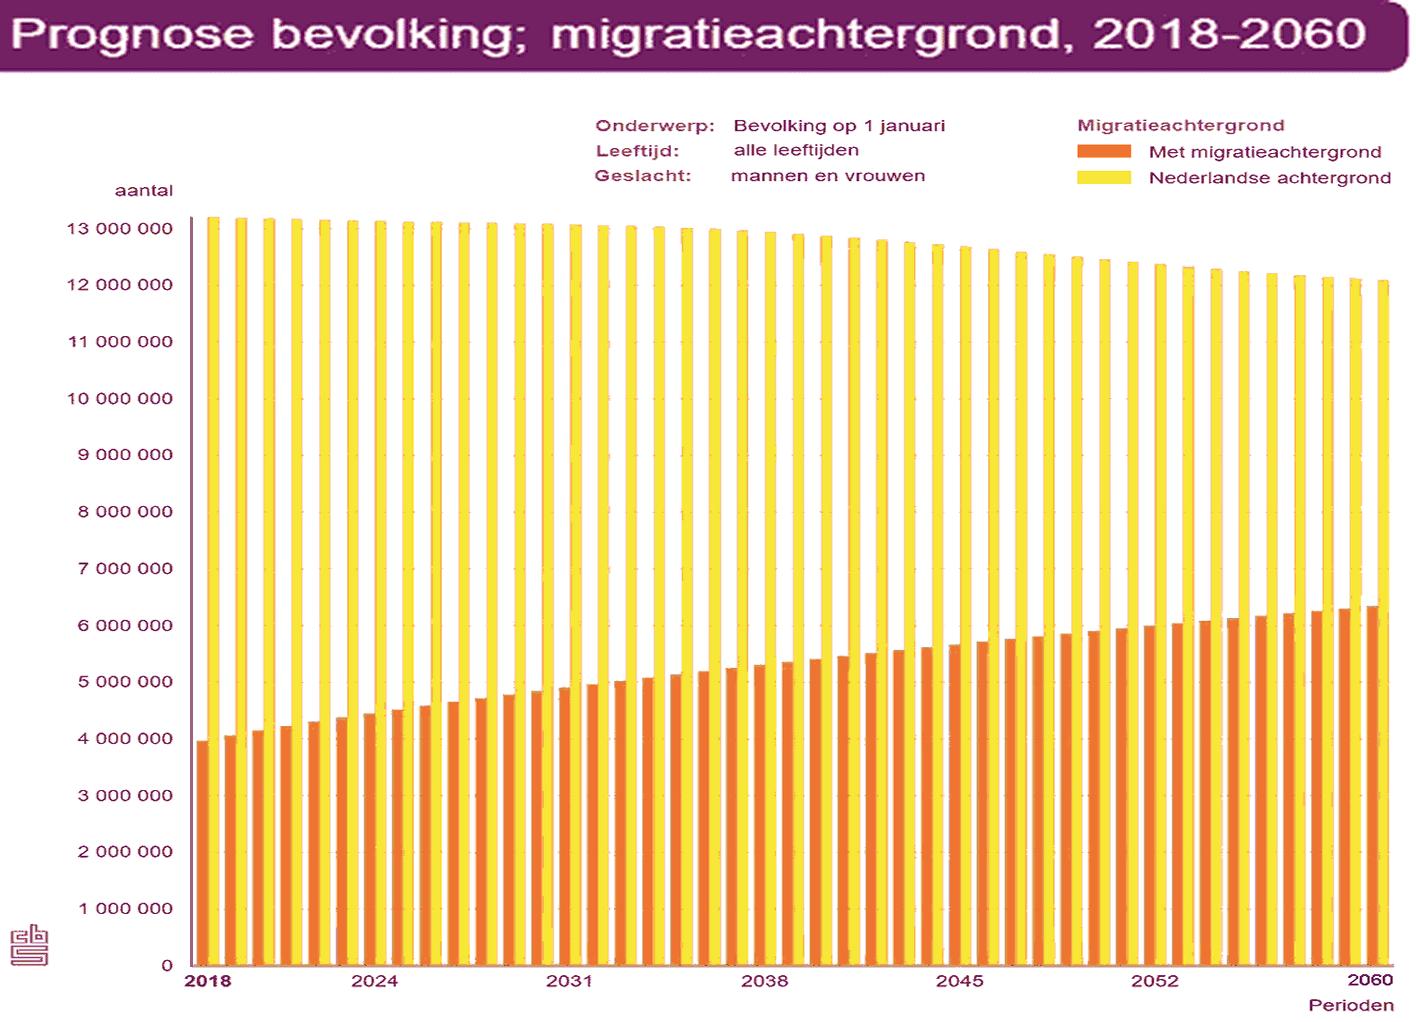 Prognose groei bevolking, migratie achtergrond